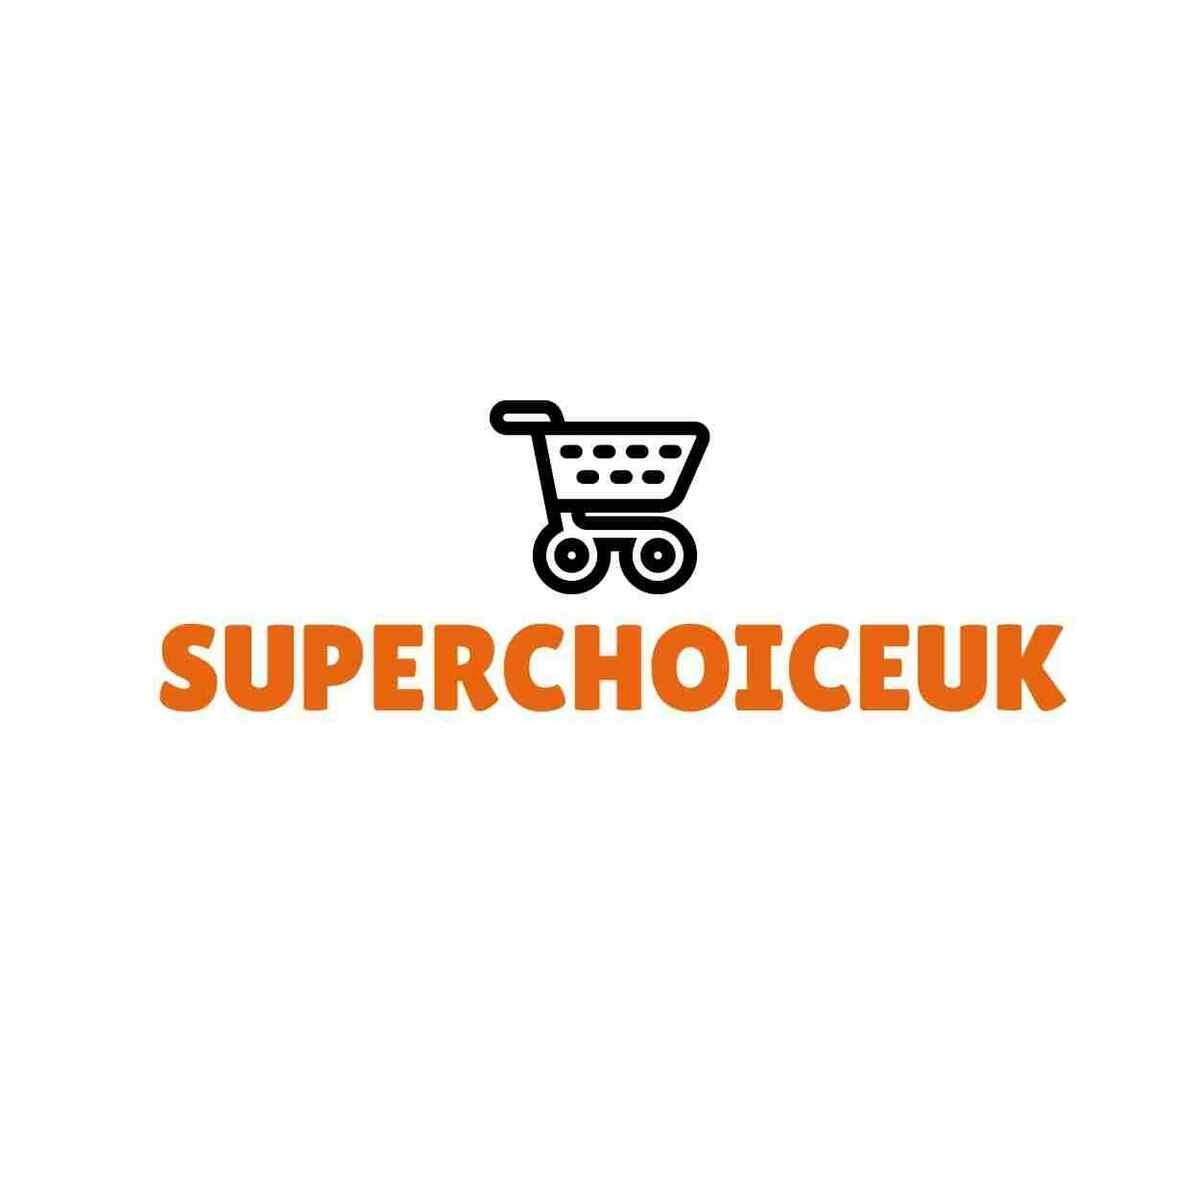 superchoiceuk